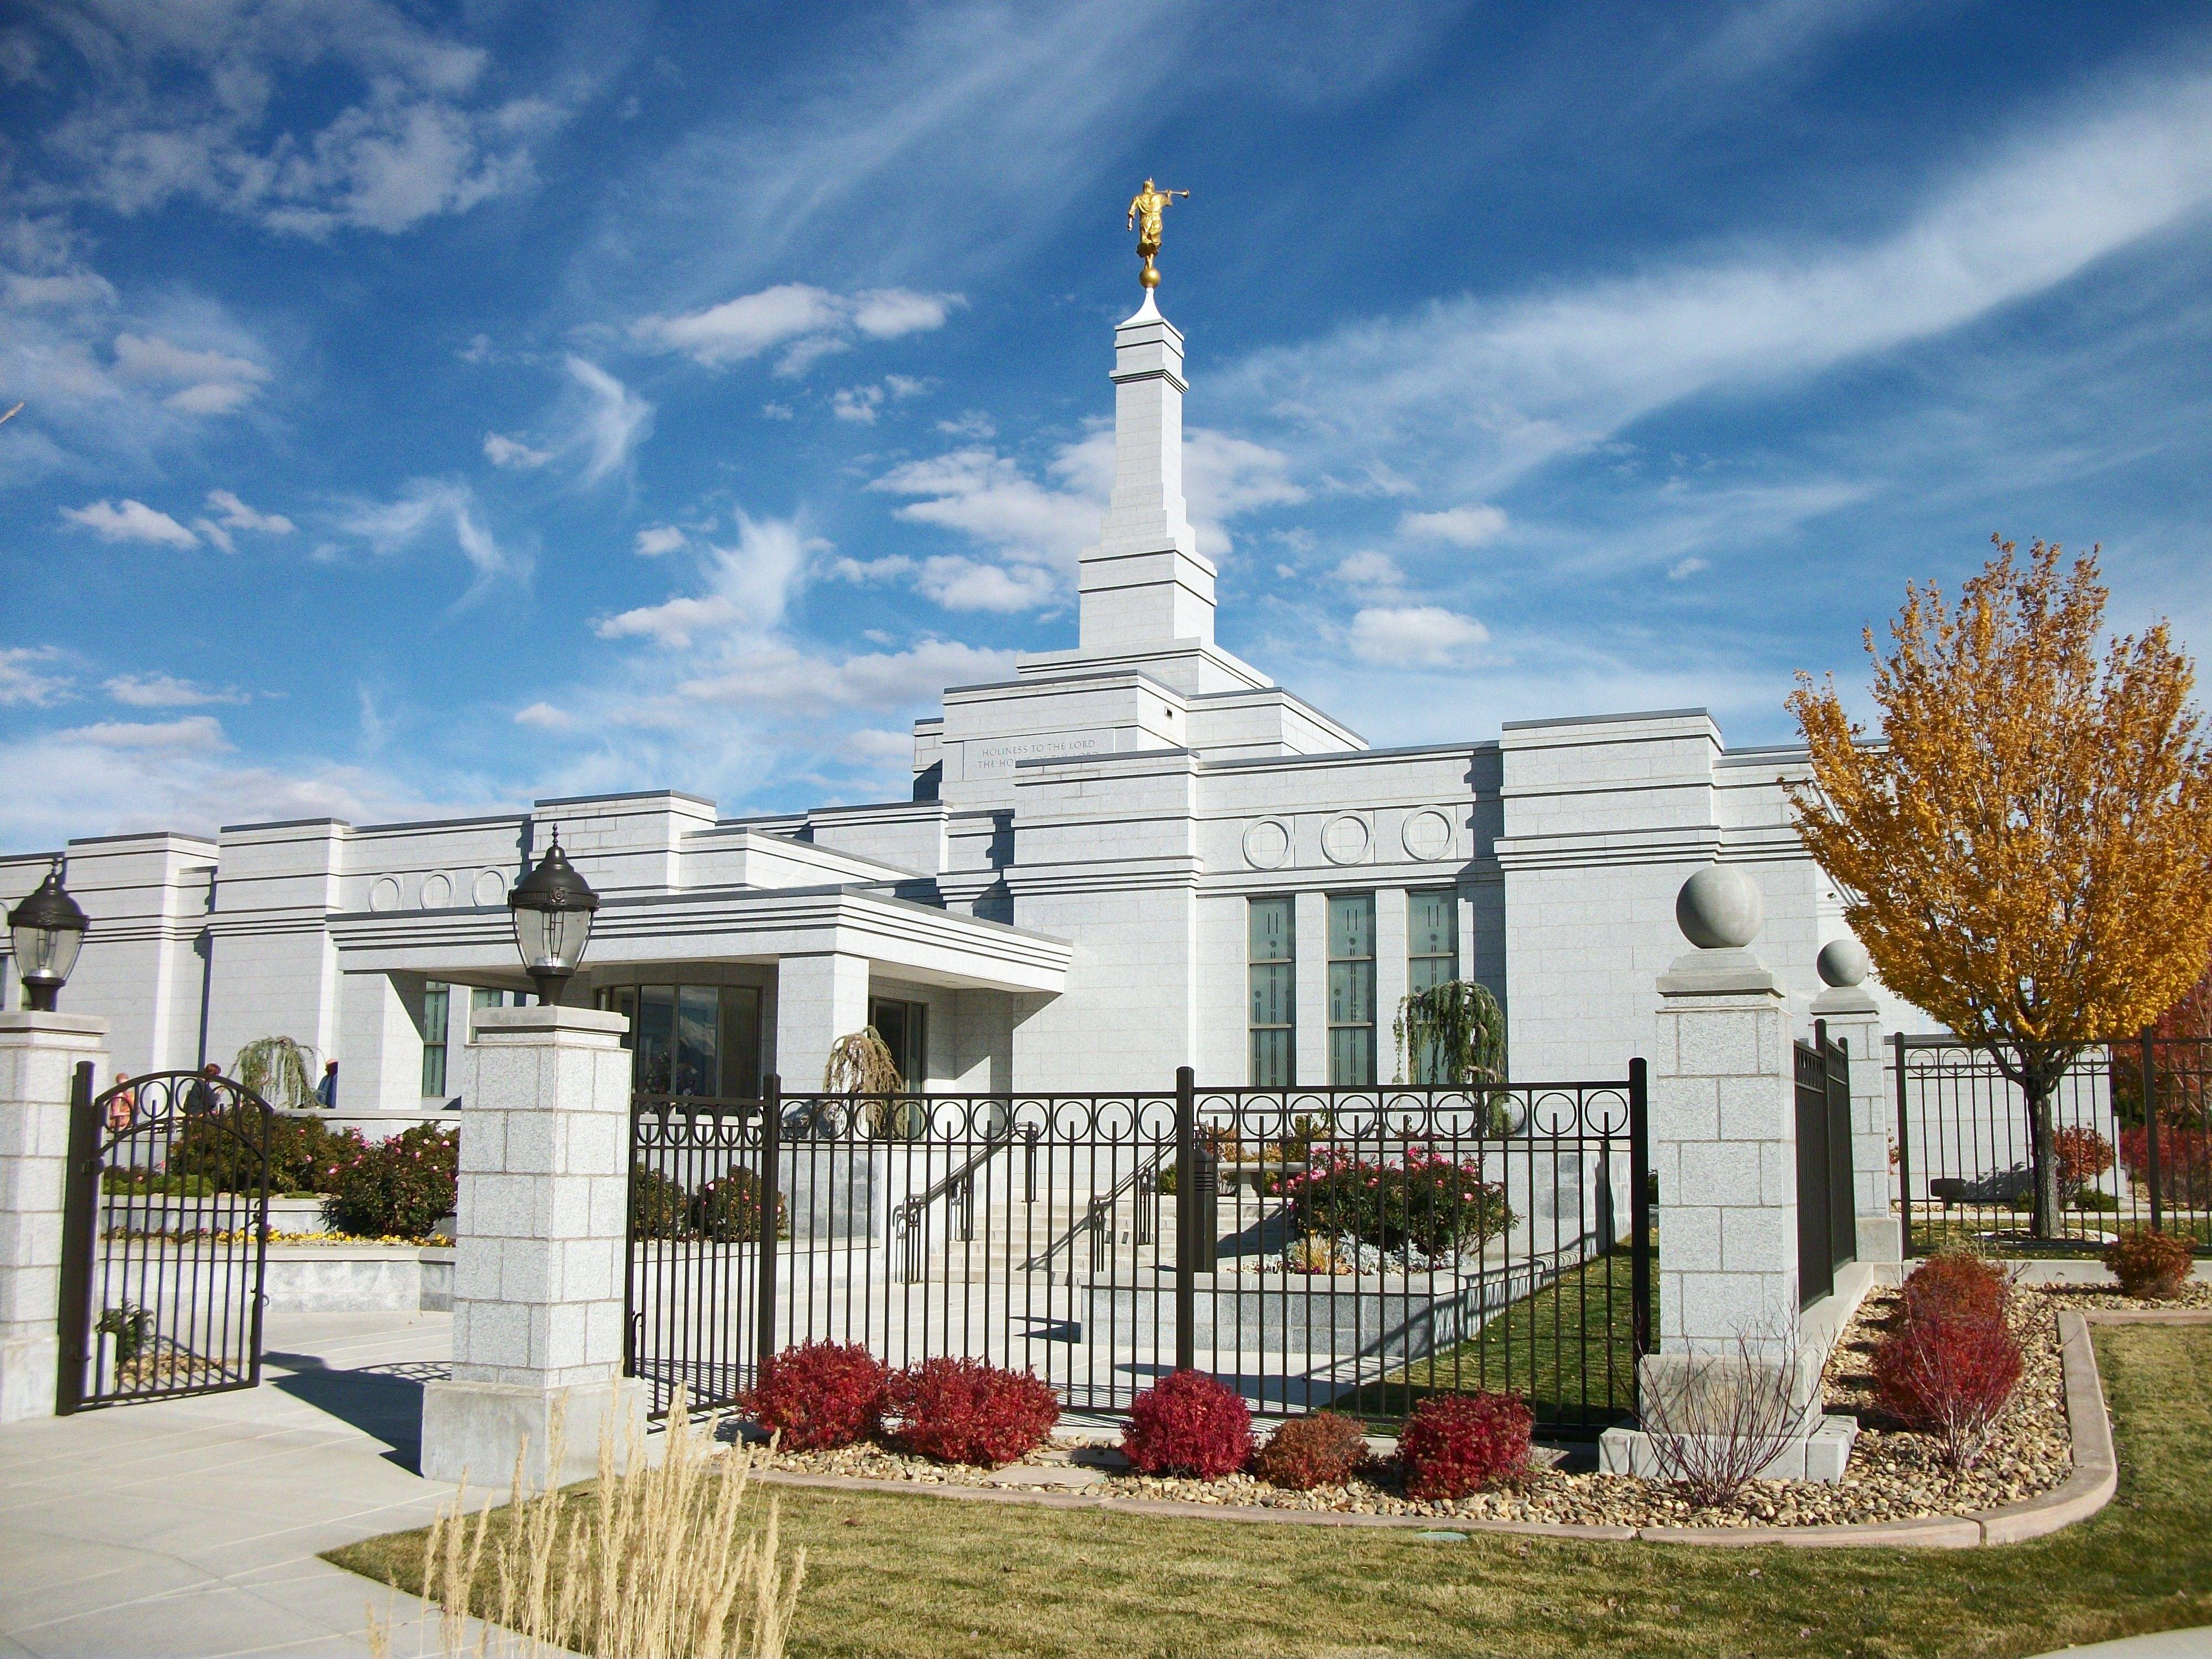 The Reno Nevada Temple entrance, including scenery.